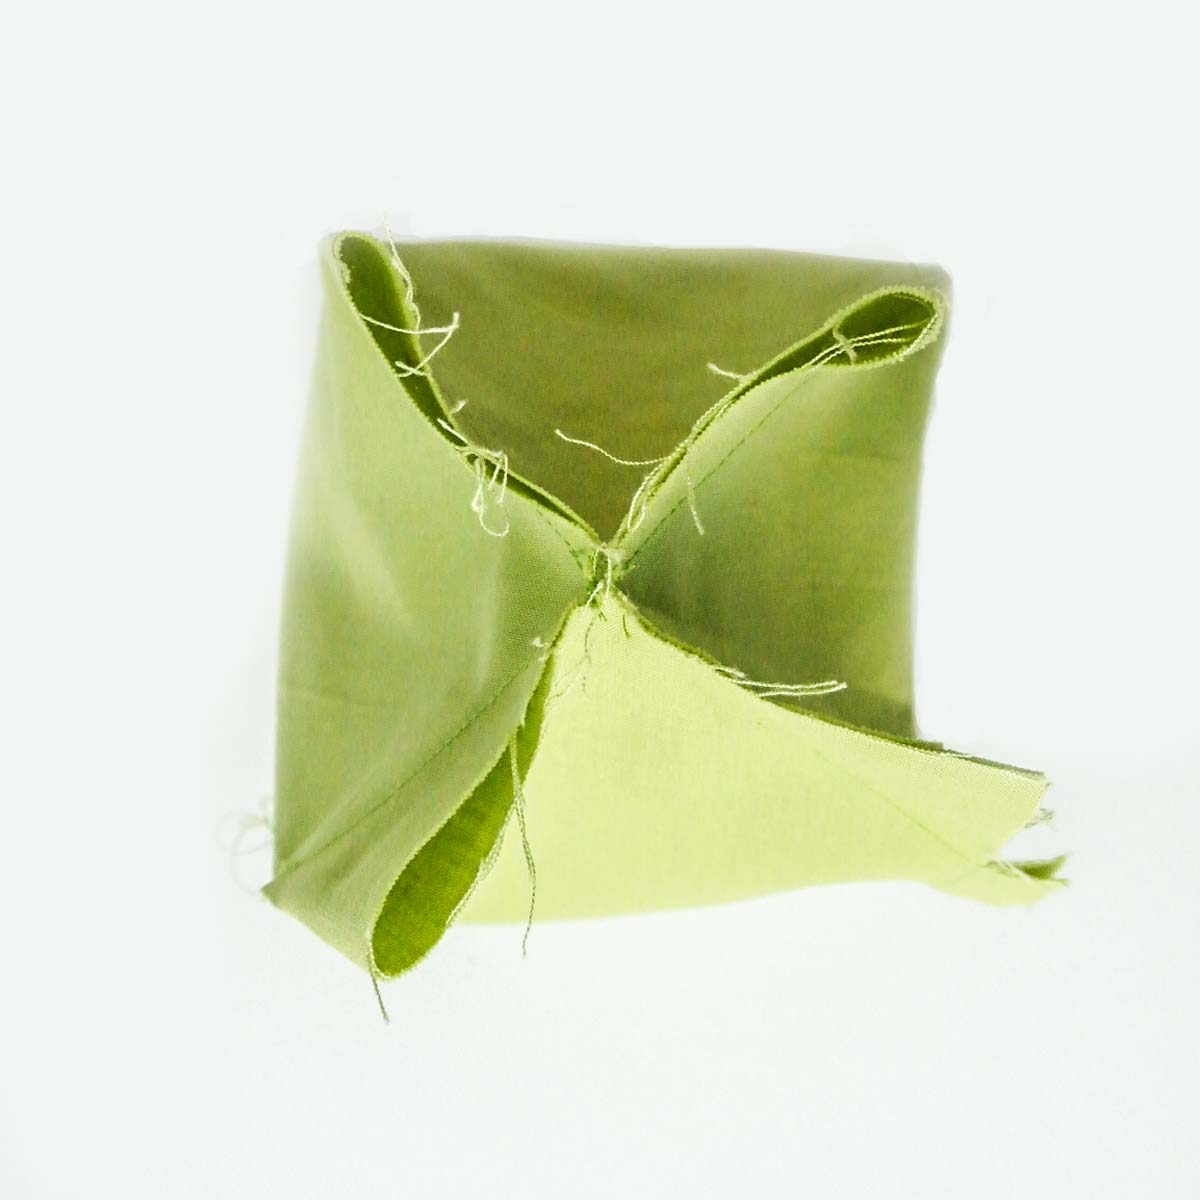 Bottom of DIY dice bag lining sewn. Dice Bag Pattern Free